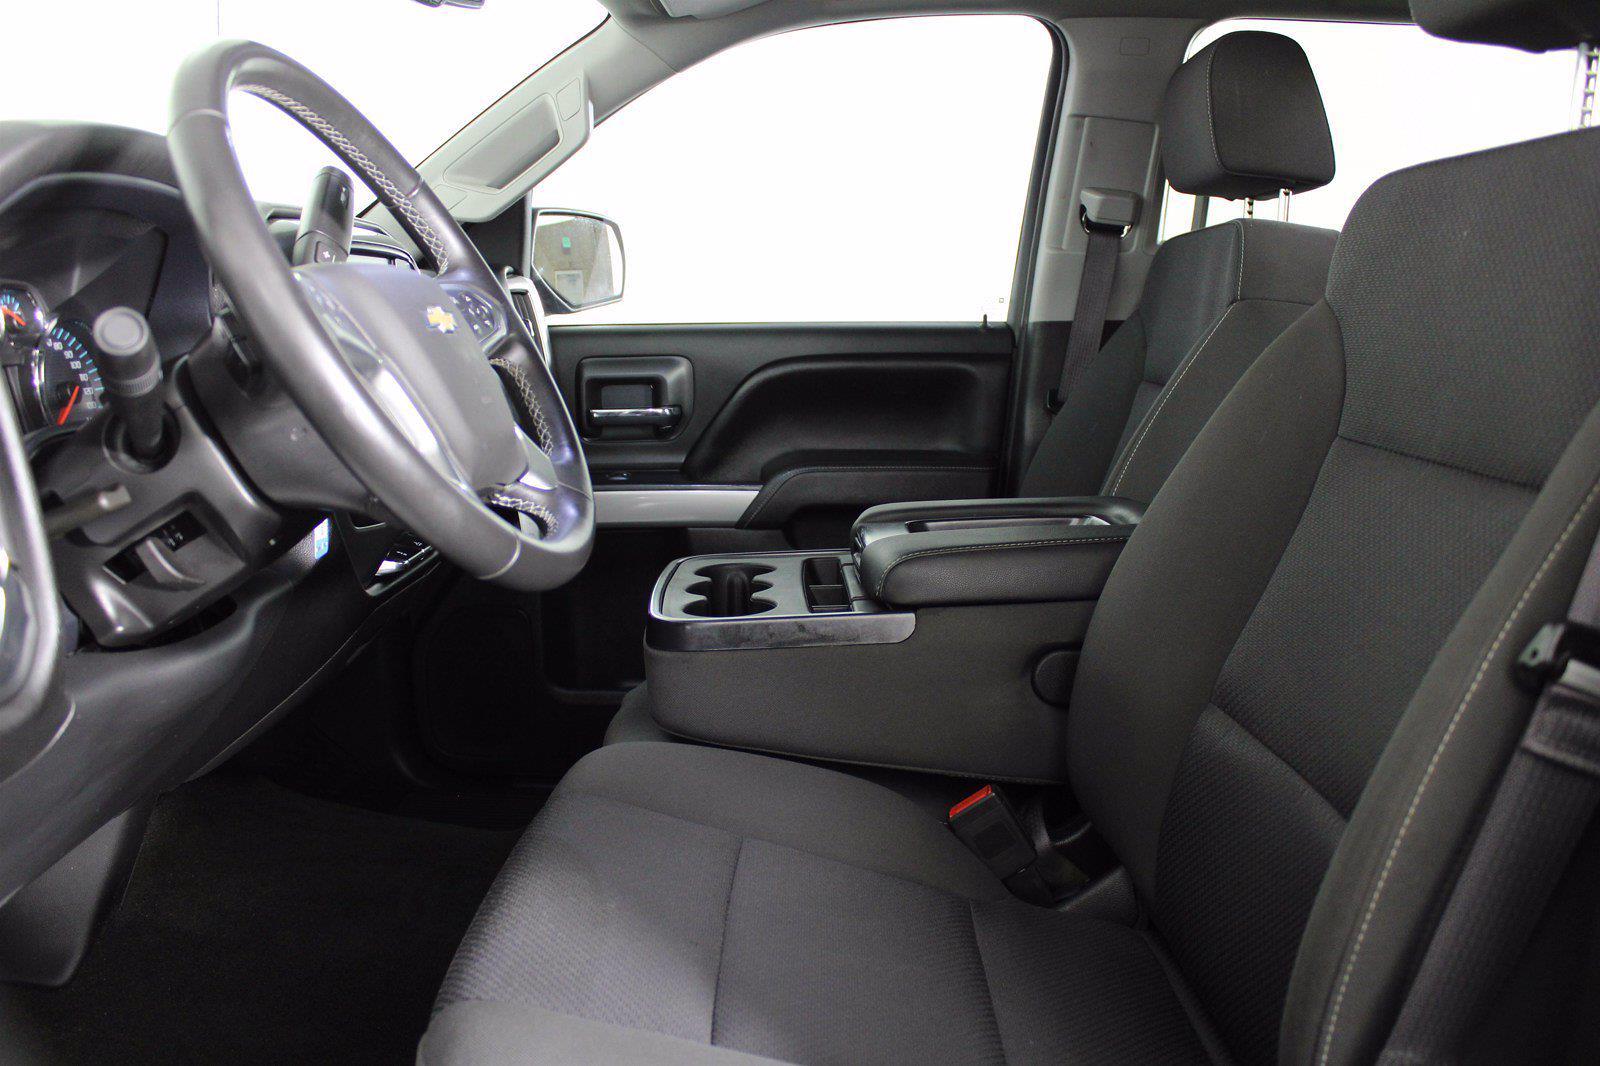 2017 Chevrolet Silverado 1500 Crew Cab 4x4, Pickup #D110857A - photo 4